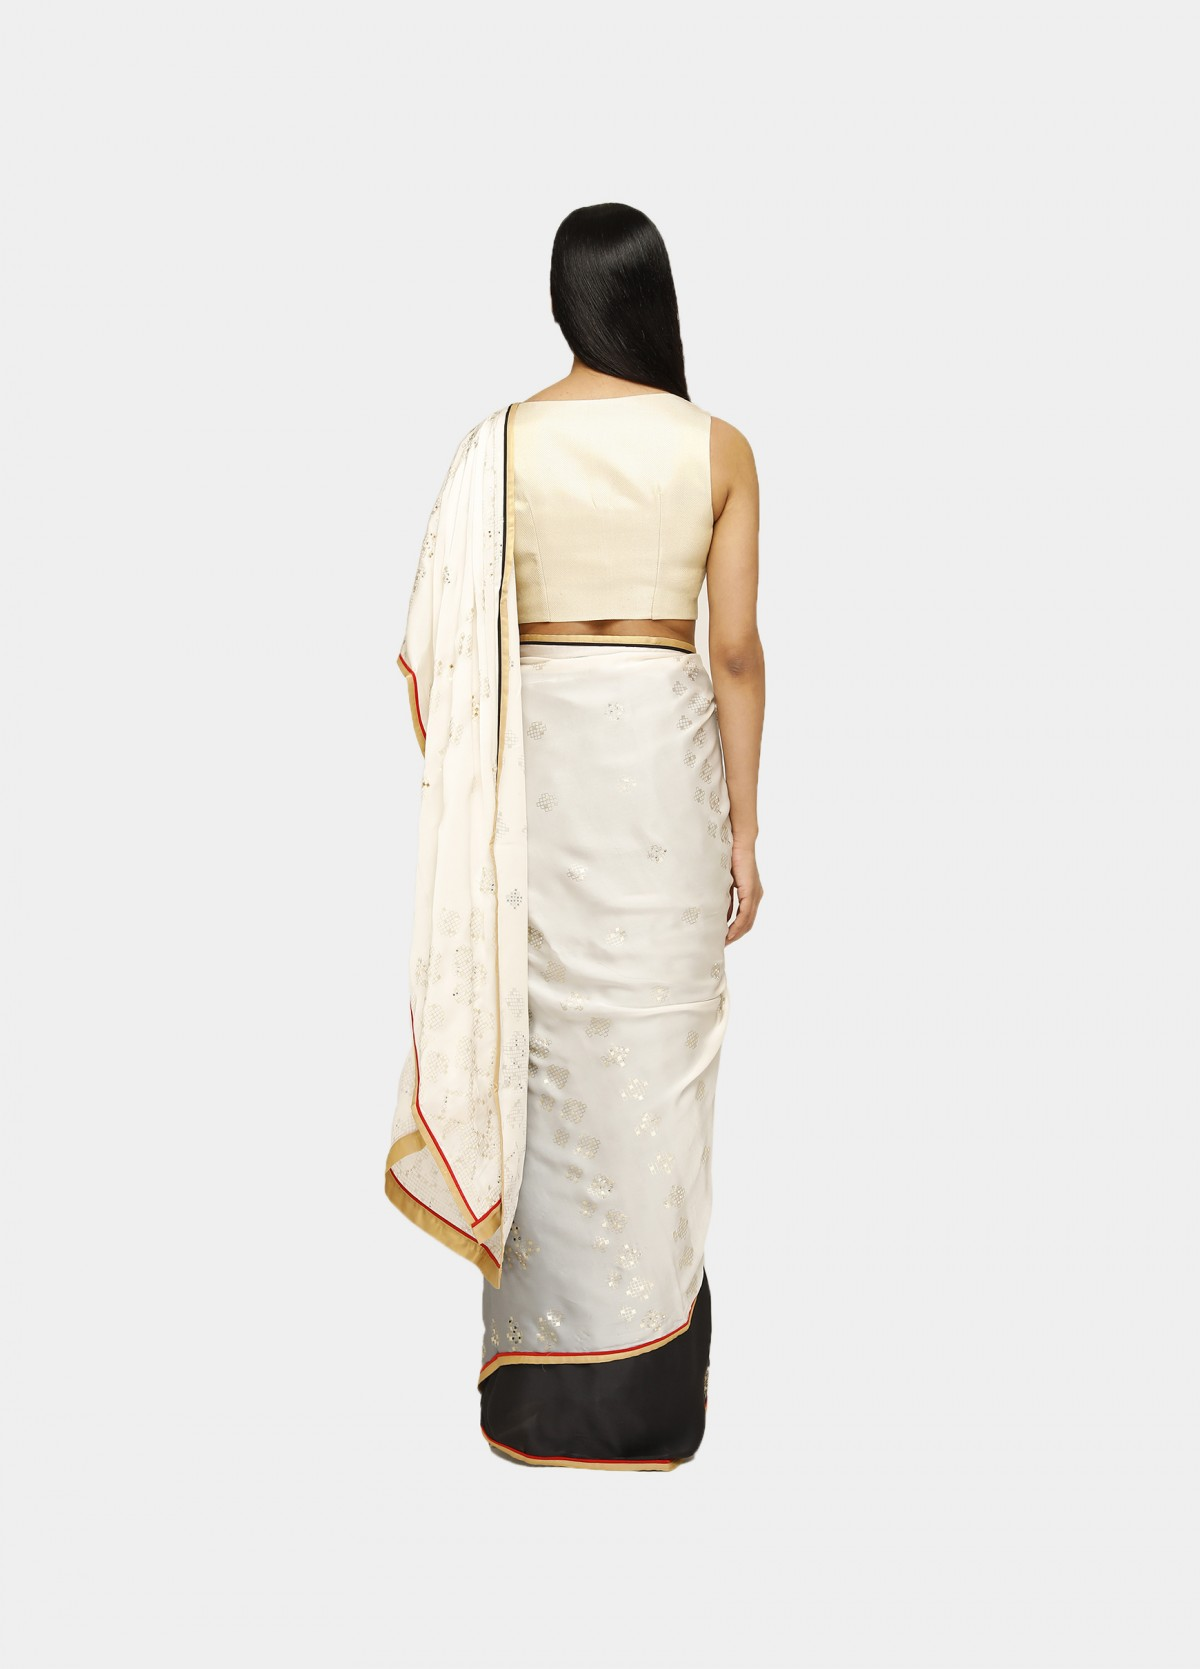 The Geometric Deck Sari